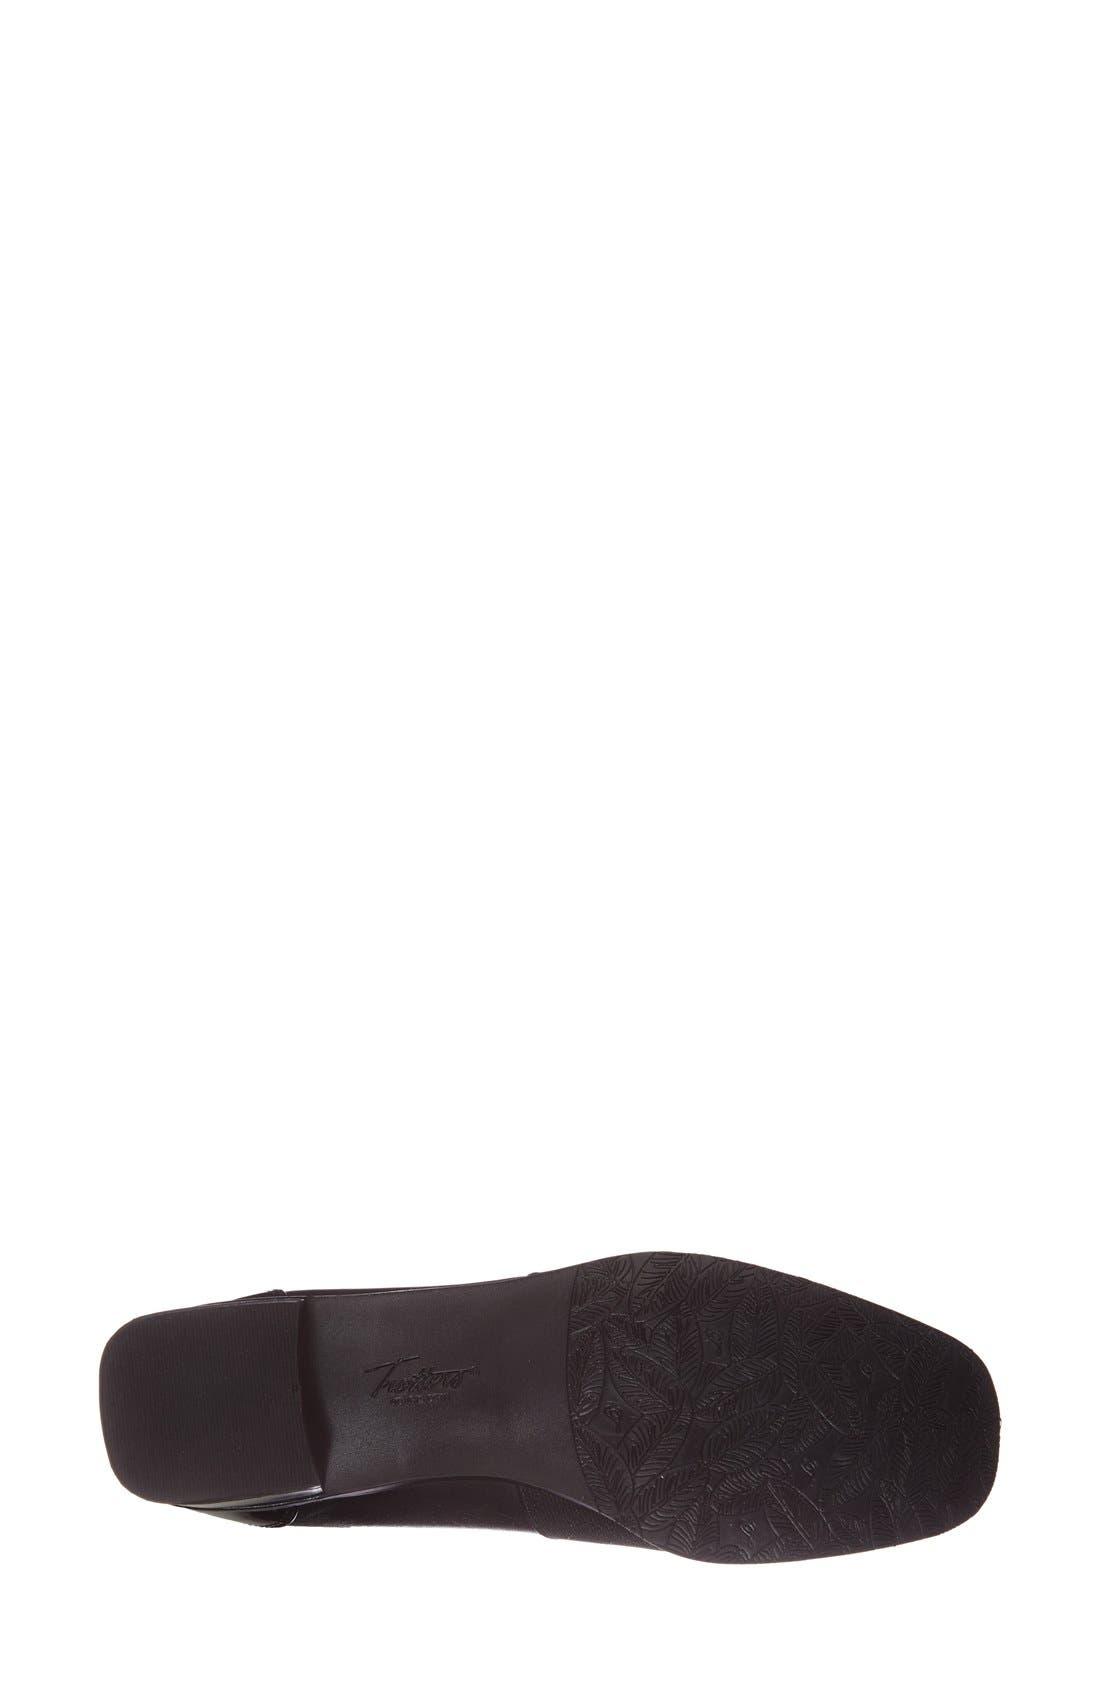 'Arianna' Loafer,                             Alternate thumbnail 4, color,                             Black